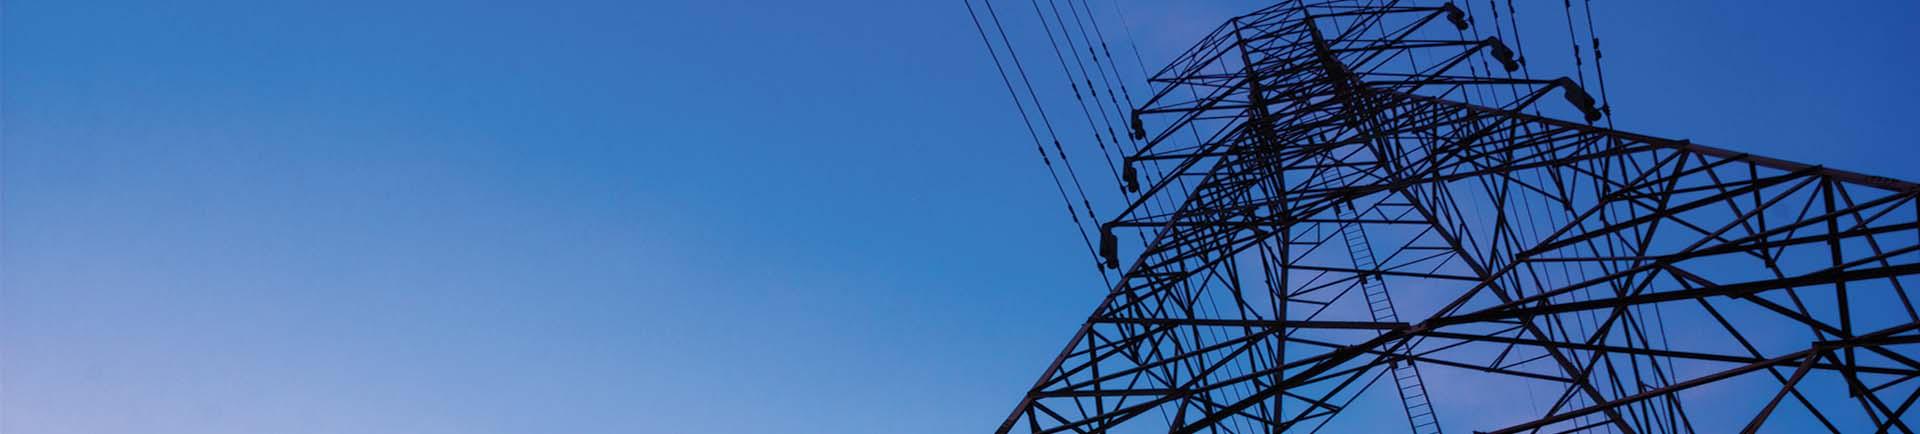 R S  Infraprojects Pvt  Ltd  - Power Transmission EPC